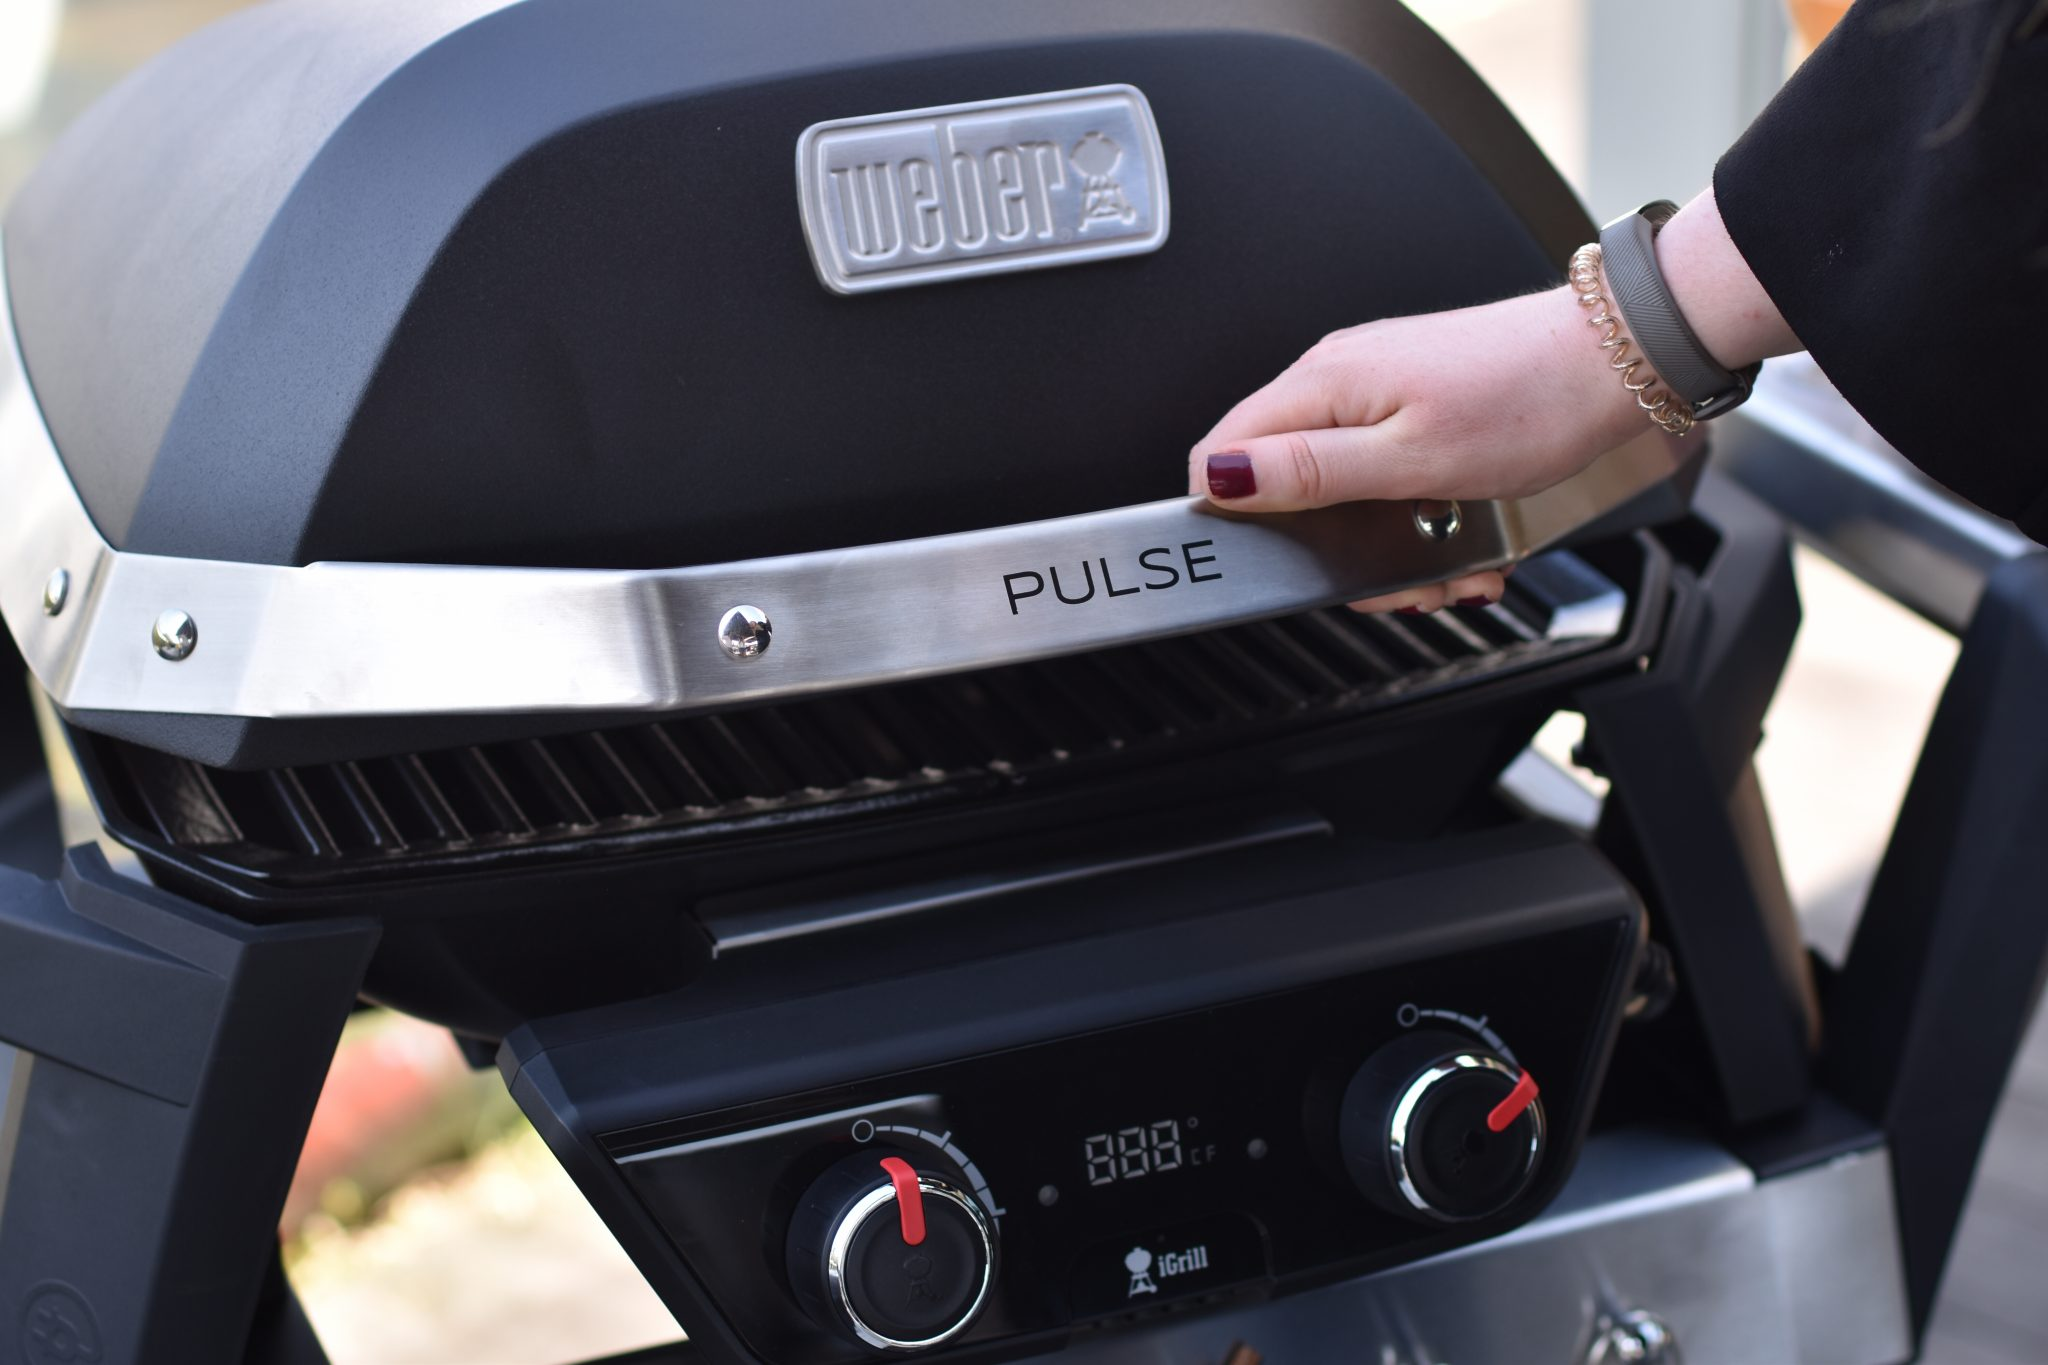 pulse-grill